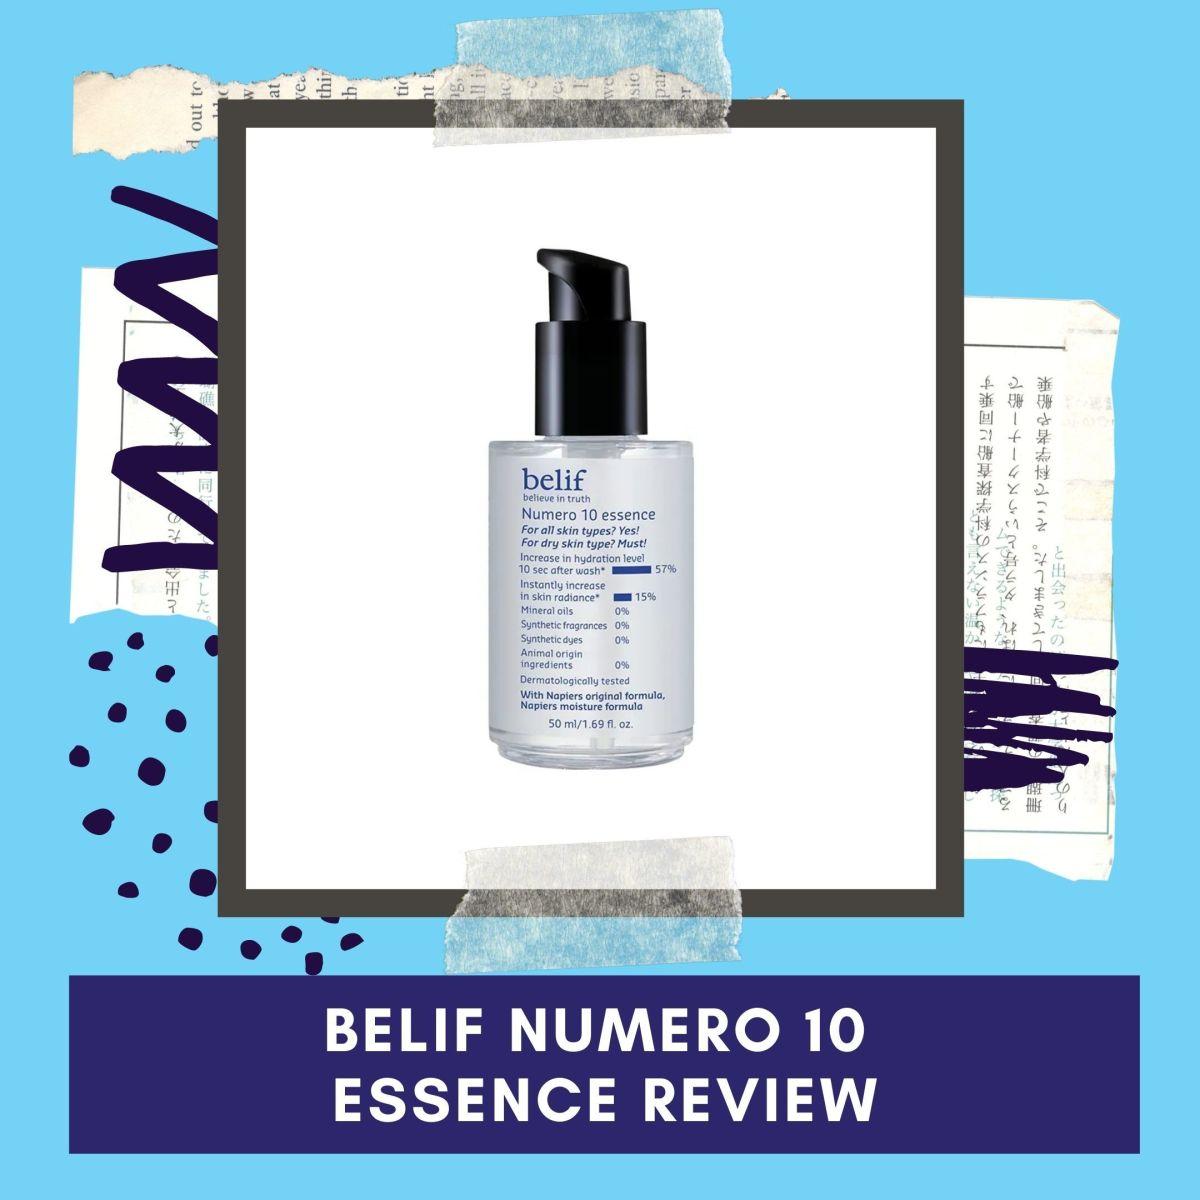 belif-numero-10-essence-review